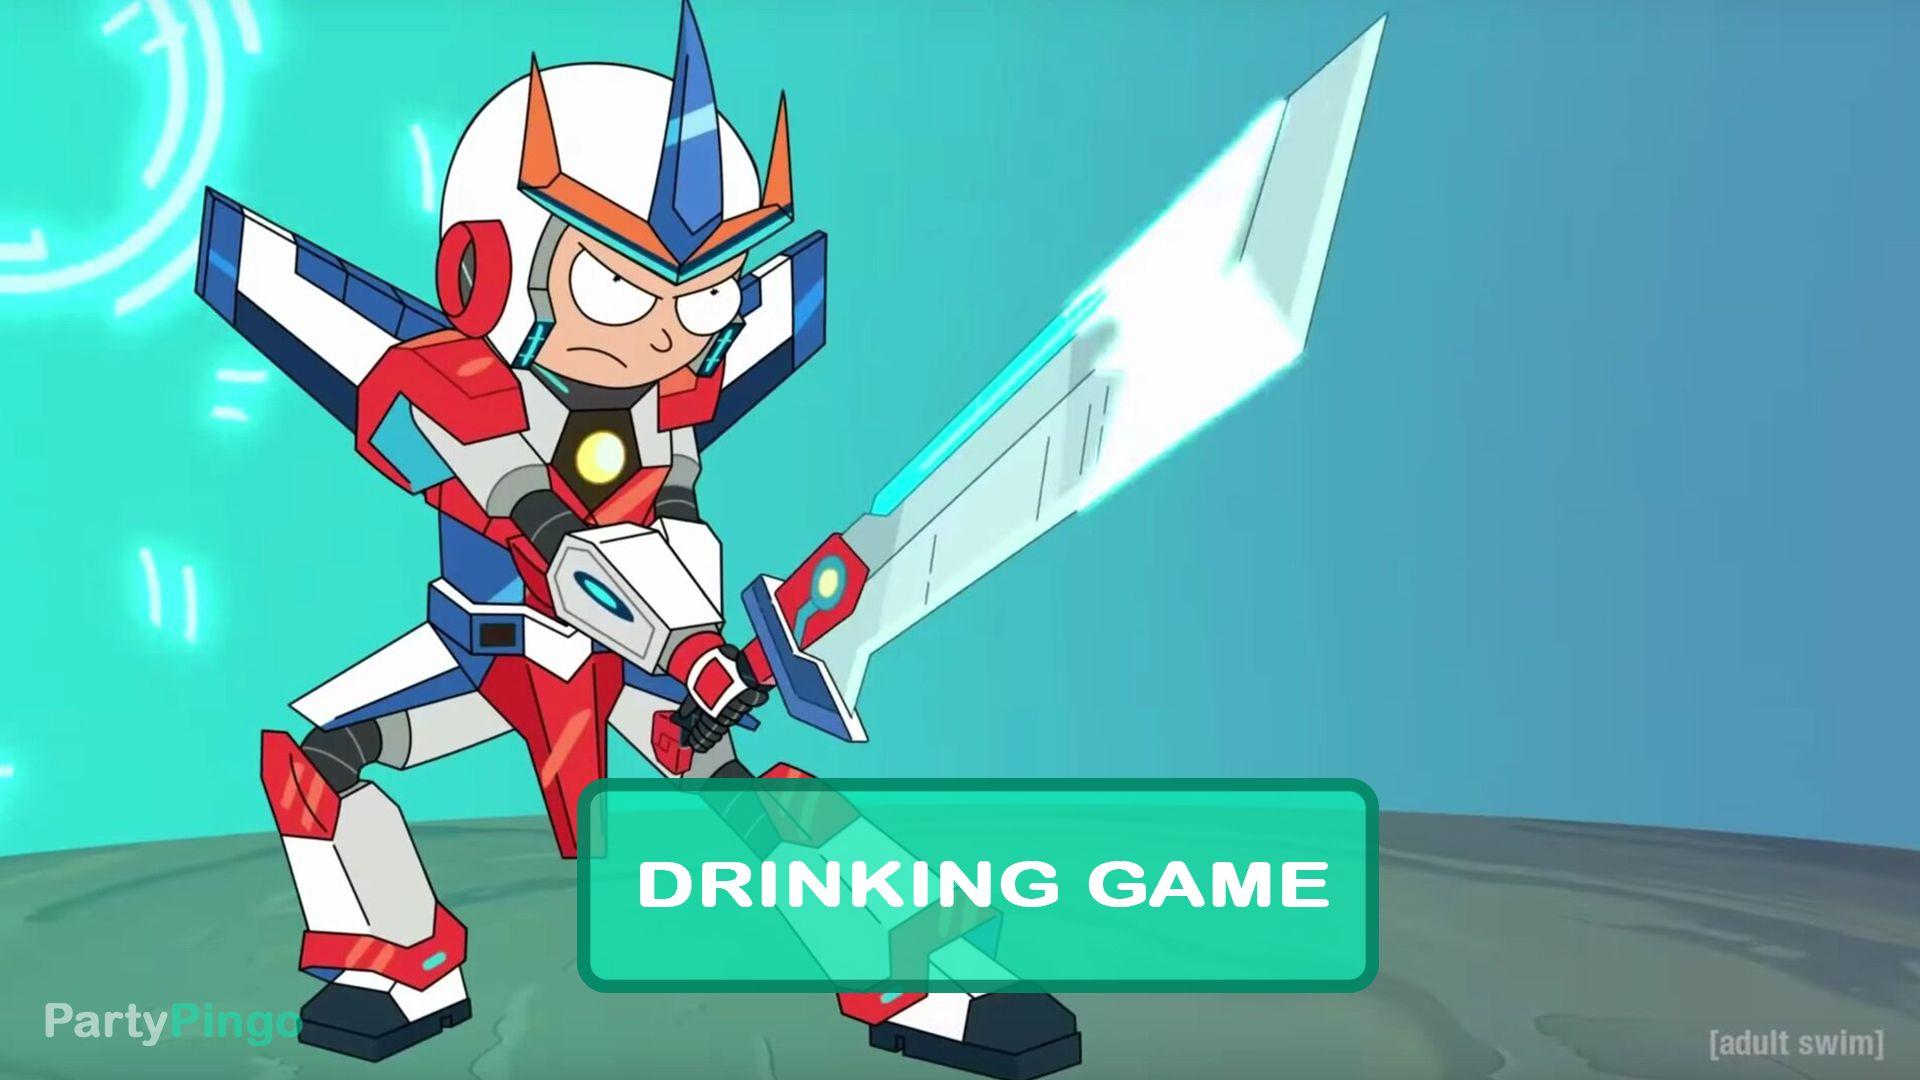 Rick And Morty Promortyus Drinking Game Season 4 Episode 7 Rick And Morty Drinking Games Rick And Morty Season